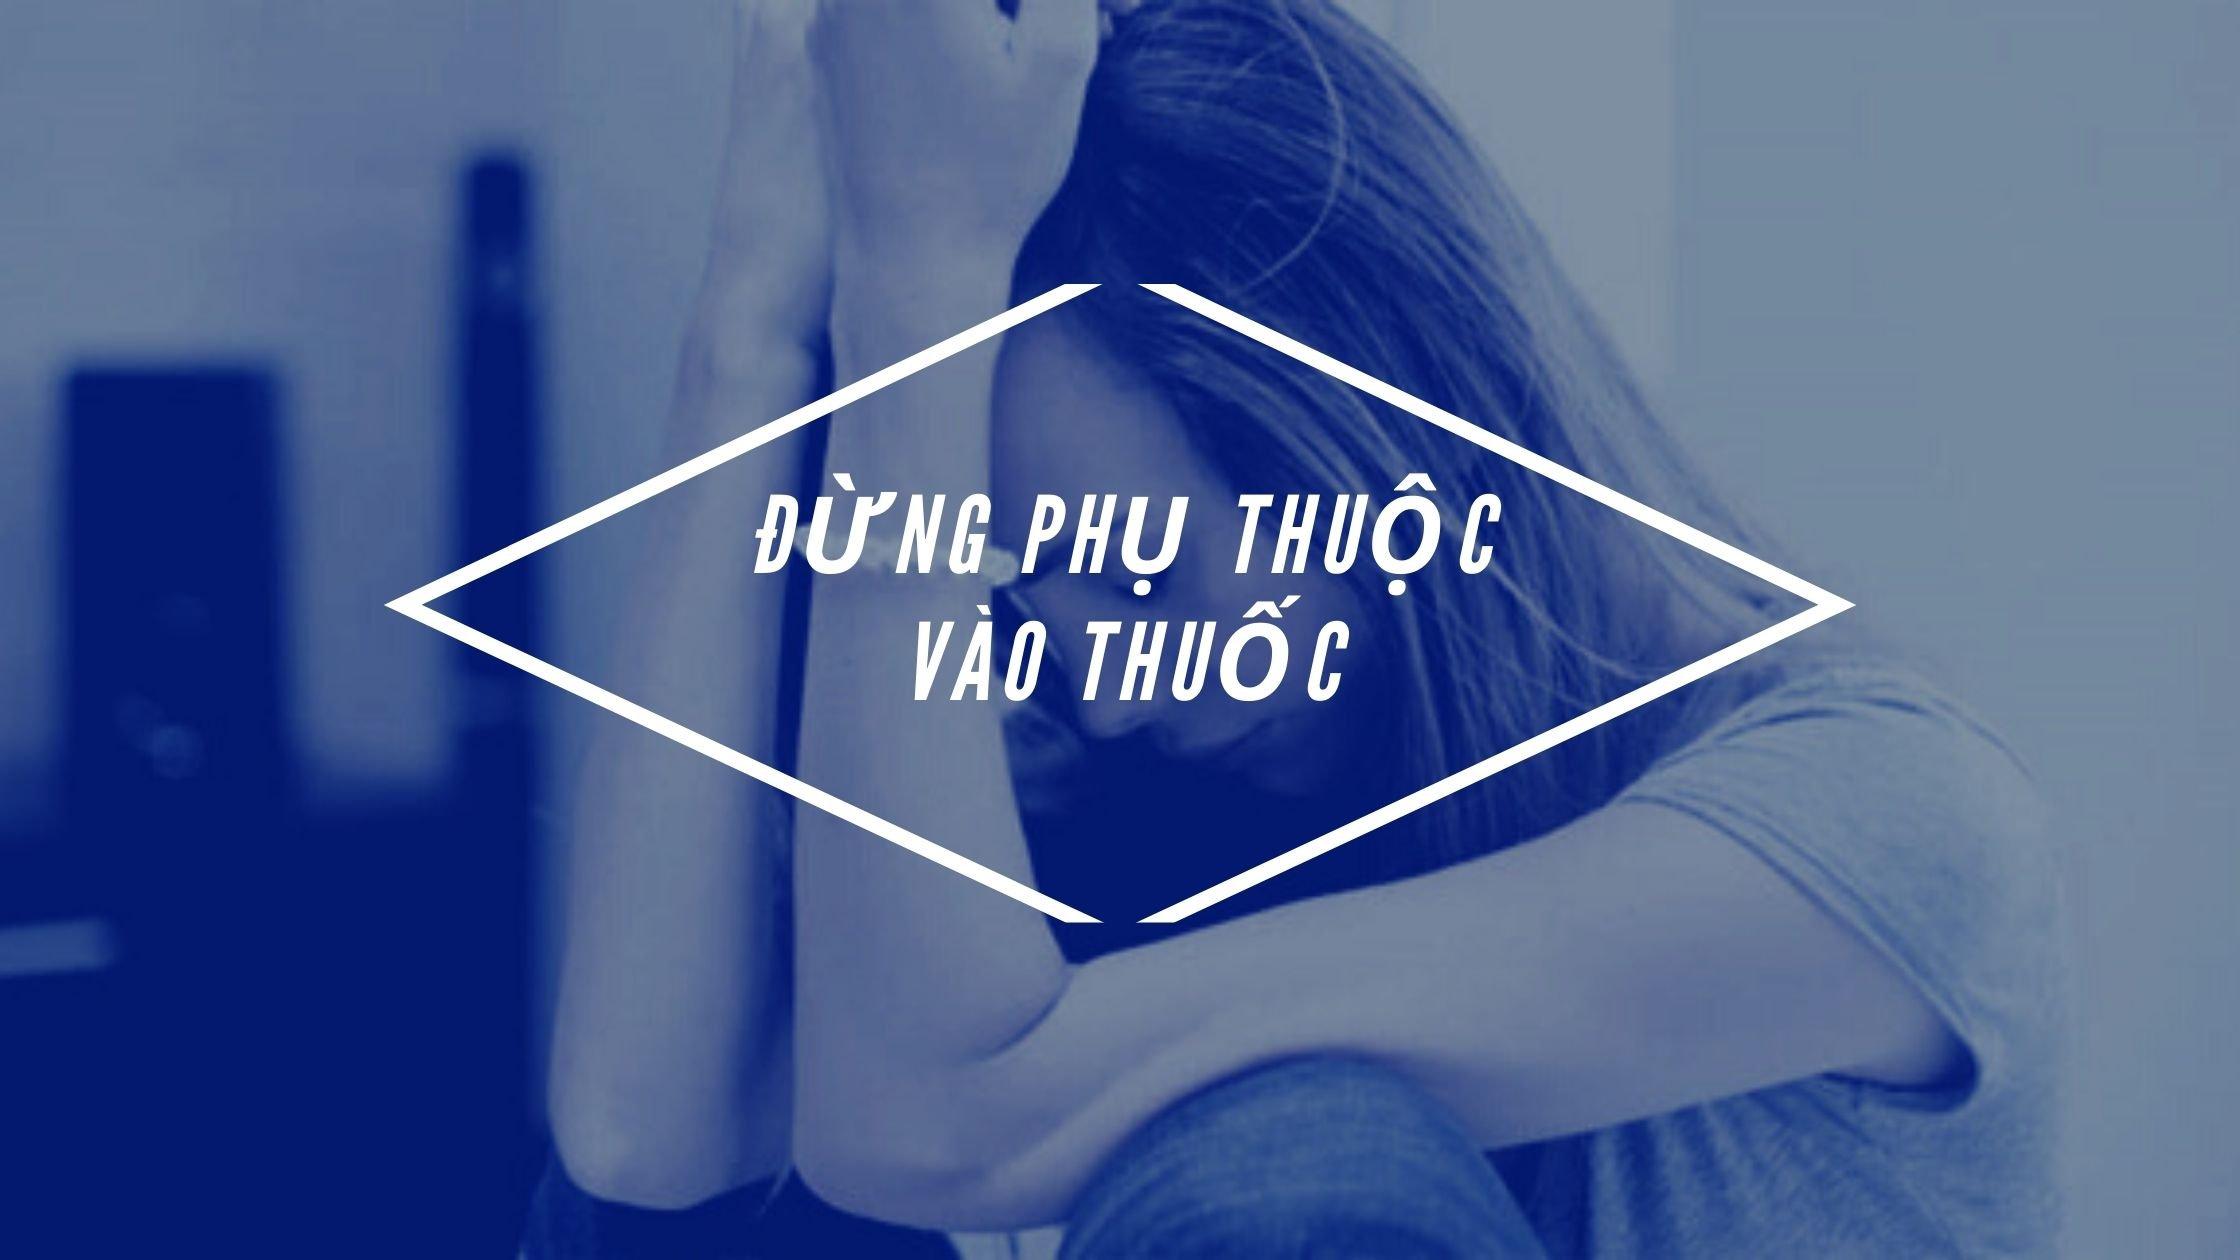 tram_cam_dung_phu_thuoc_vao_thuoc